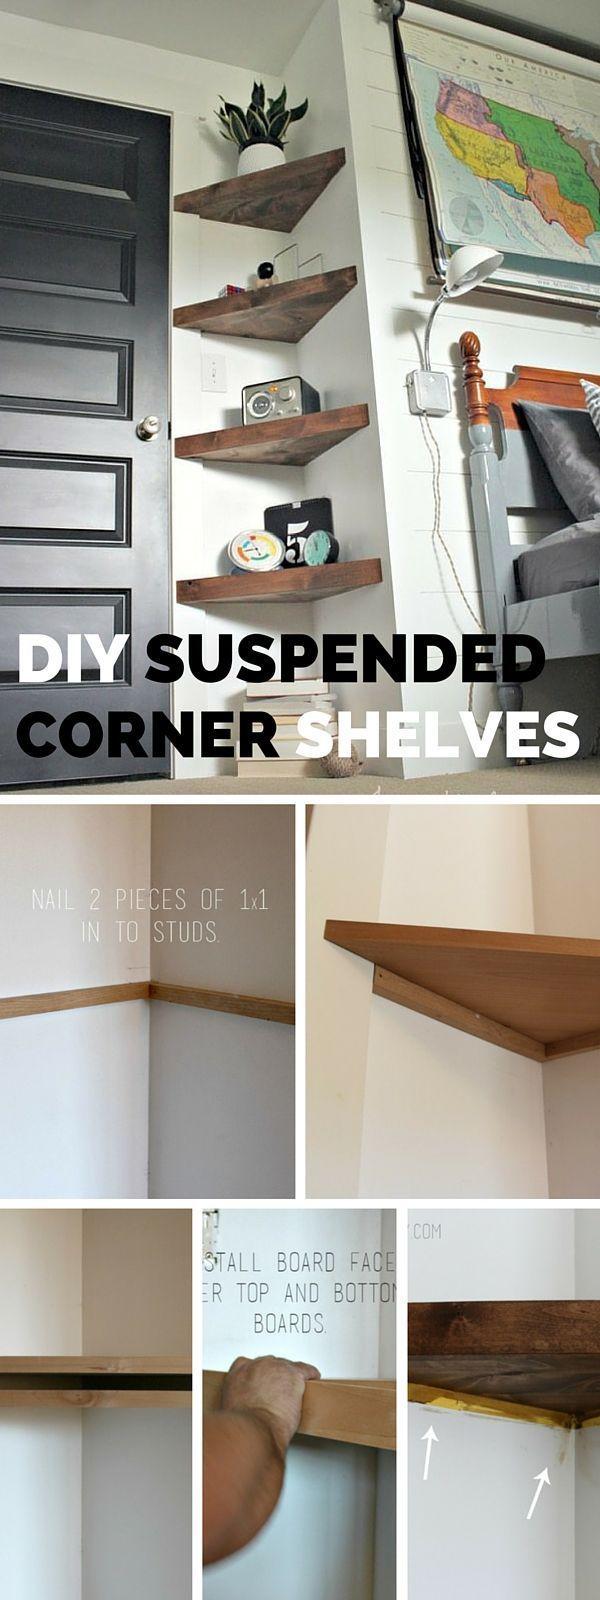 Neat Home Decor Ideas Part - 22: 12 Simply Genius DIY Storage Solutions For A Neat Home | Corner Shelf,  Shelves And Corner